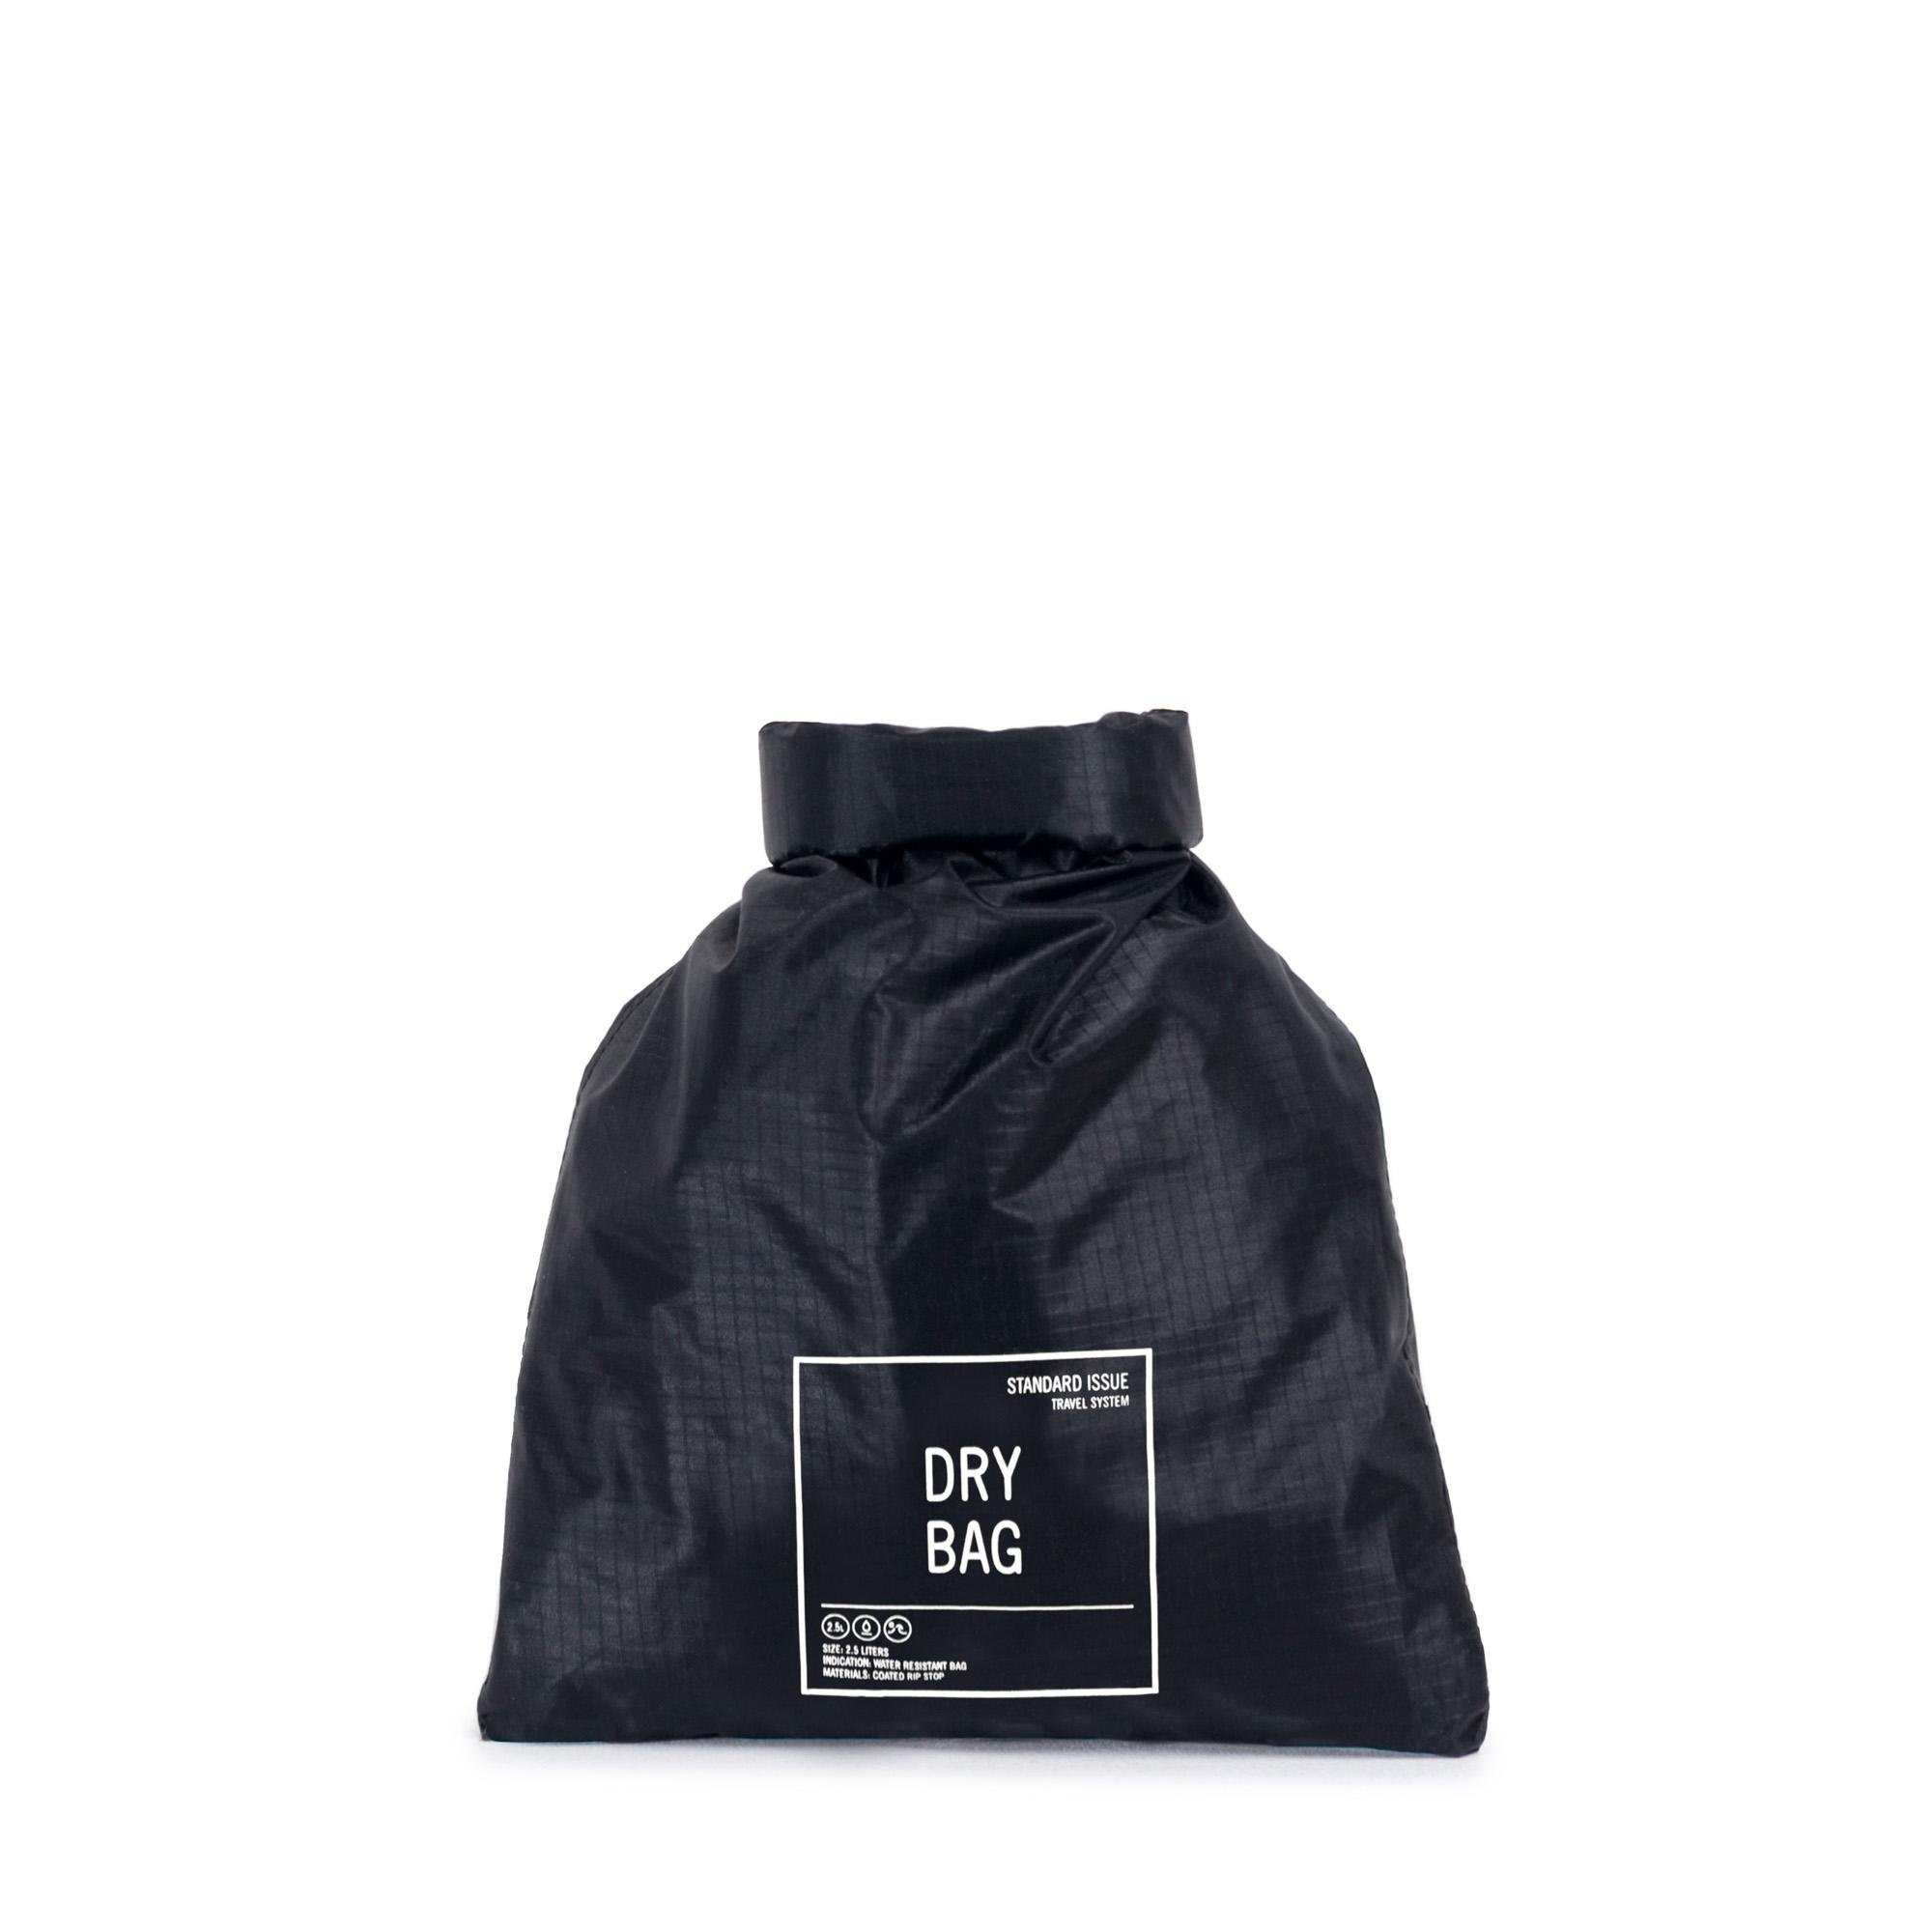 51d2b62c1ff7c Dry Bag